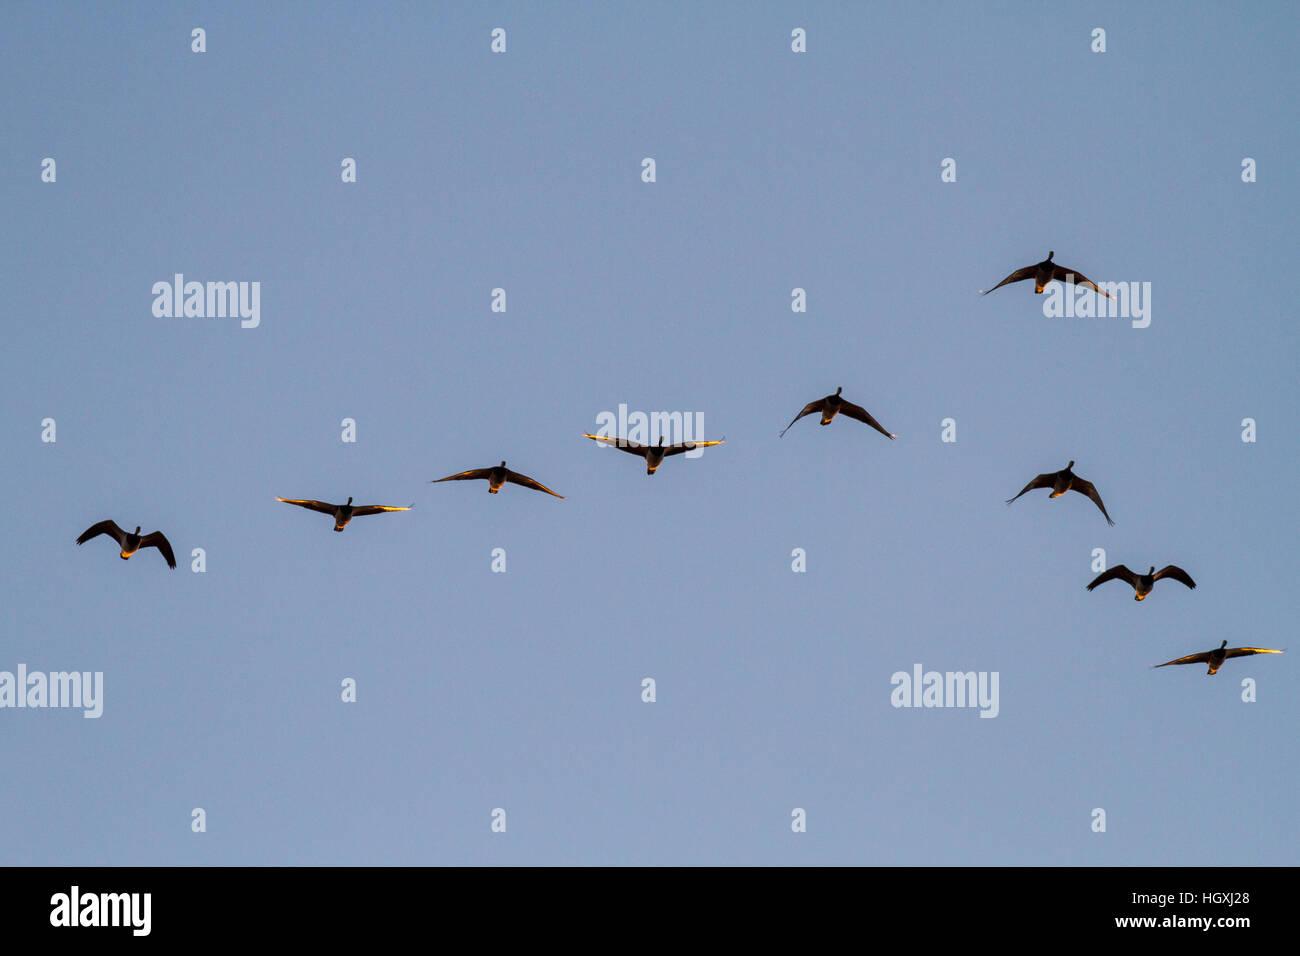 Migratory barnacle geese (branta leucopsis) catching the light of the rising sun, Isle of Islay, Scotland - Stock Image